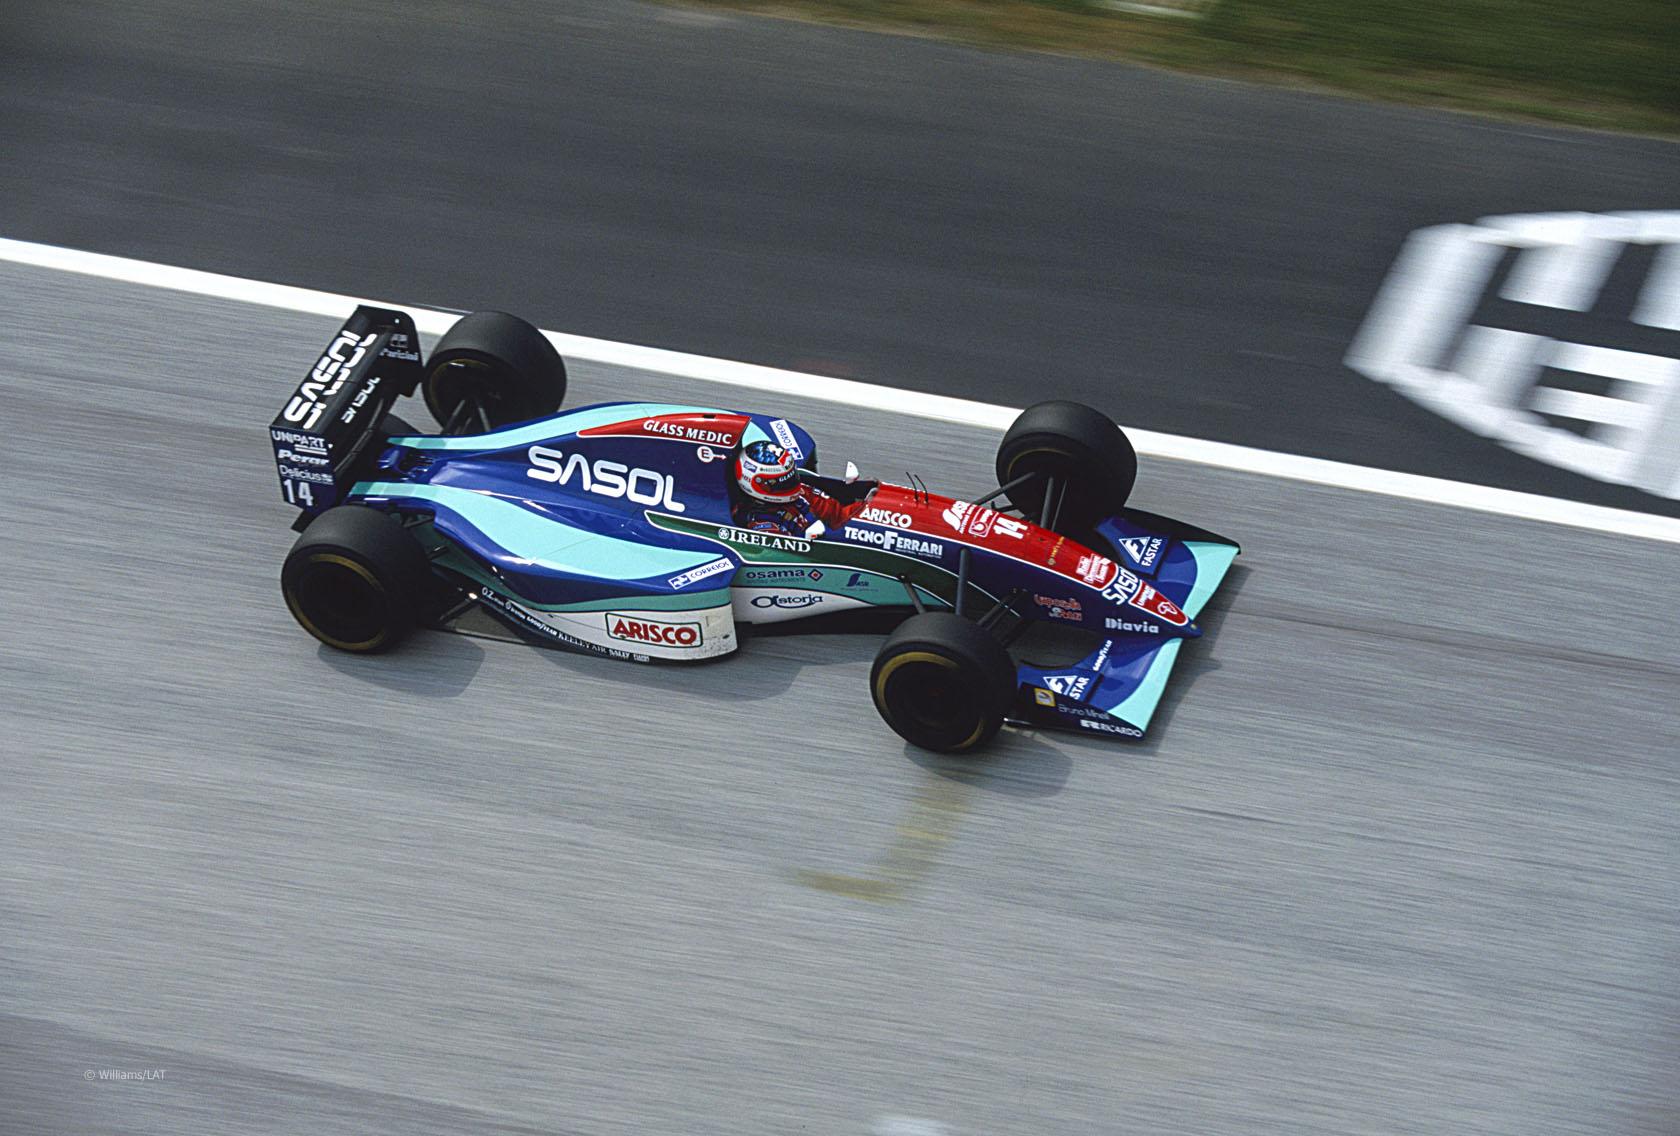 Rubens Barrichello, Jordan, Imola, 1994